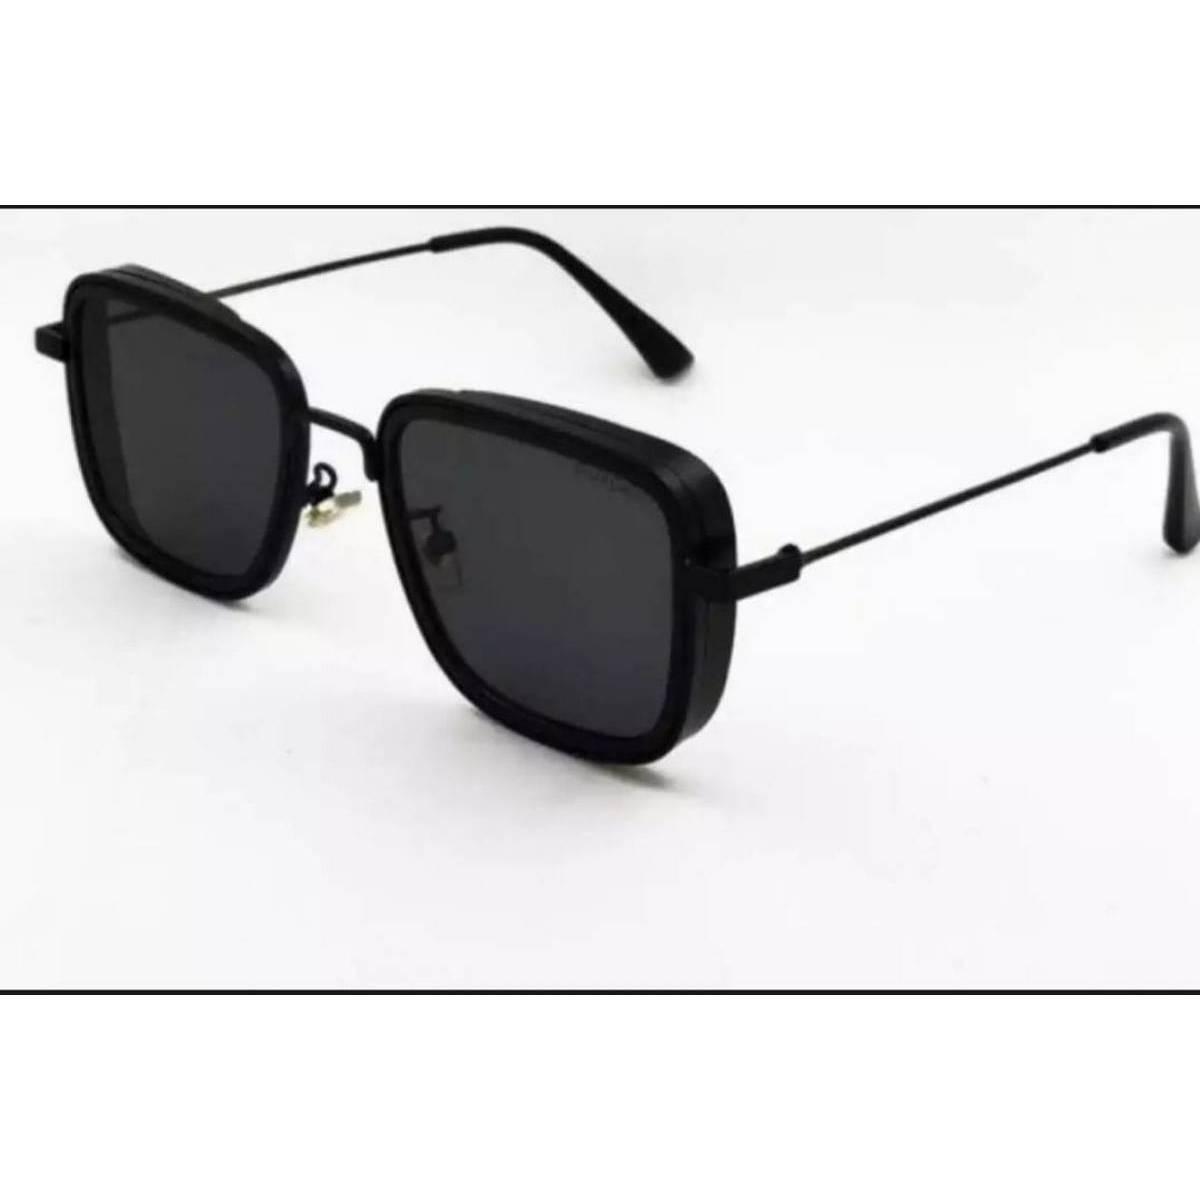 New design Kabir singh Original Luxury Fashion Square Design Metal Frame Sun Glasses For Unisex